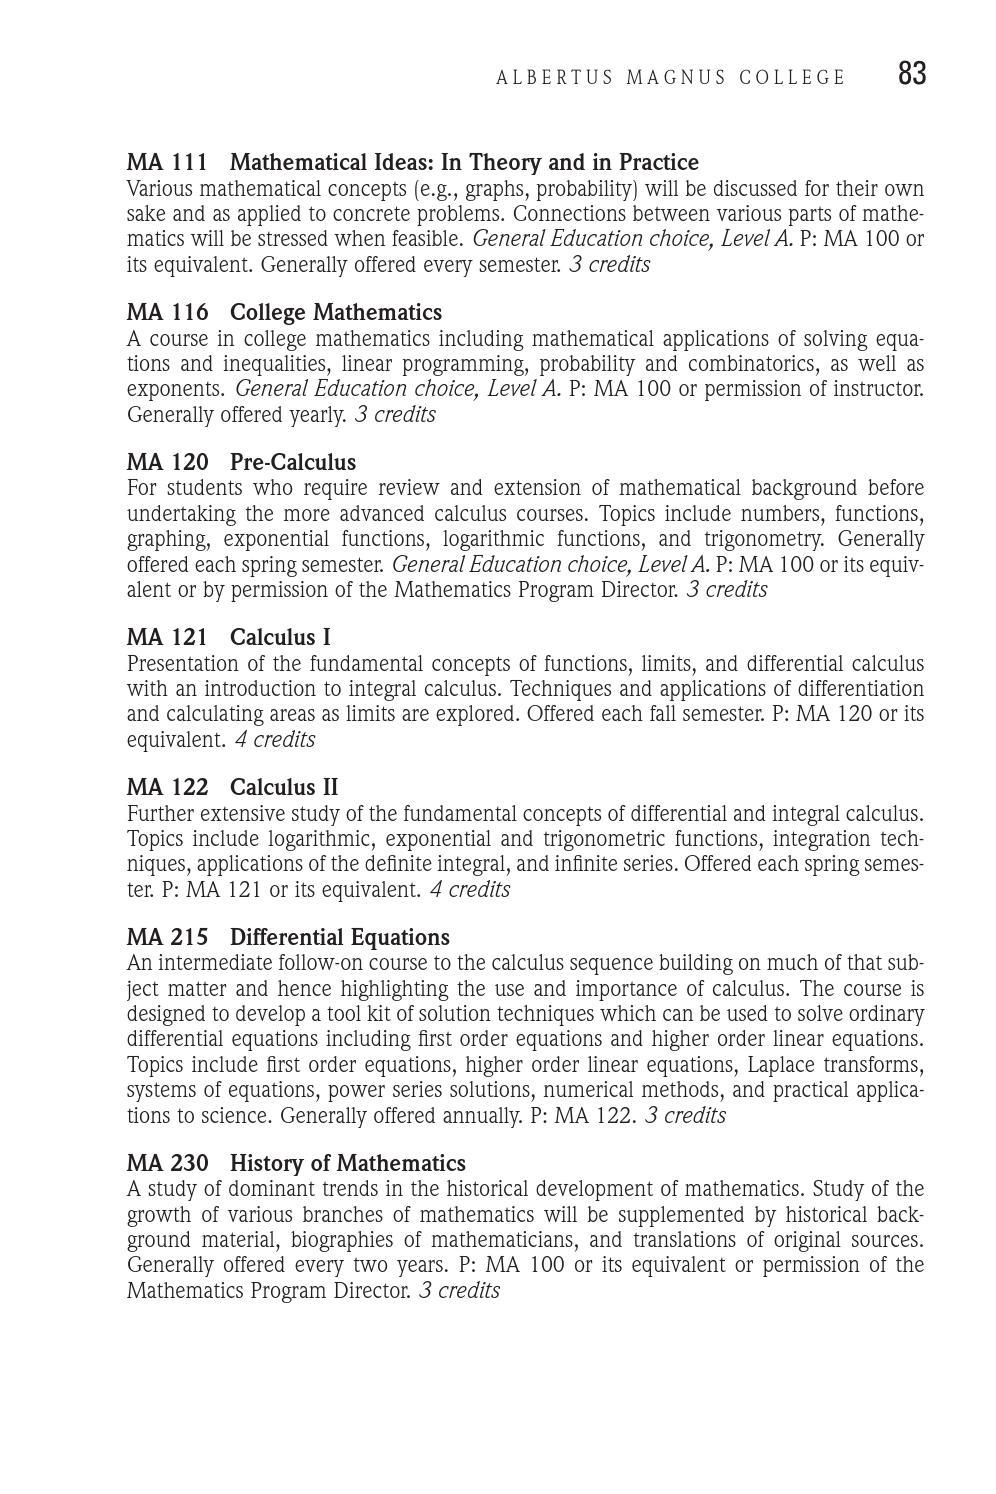 Albertus Magnus College Course Catalogue 2013-2015 by